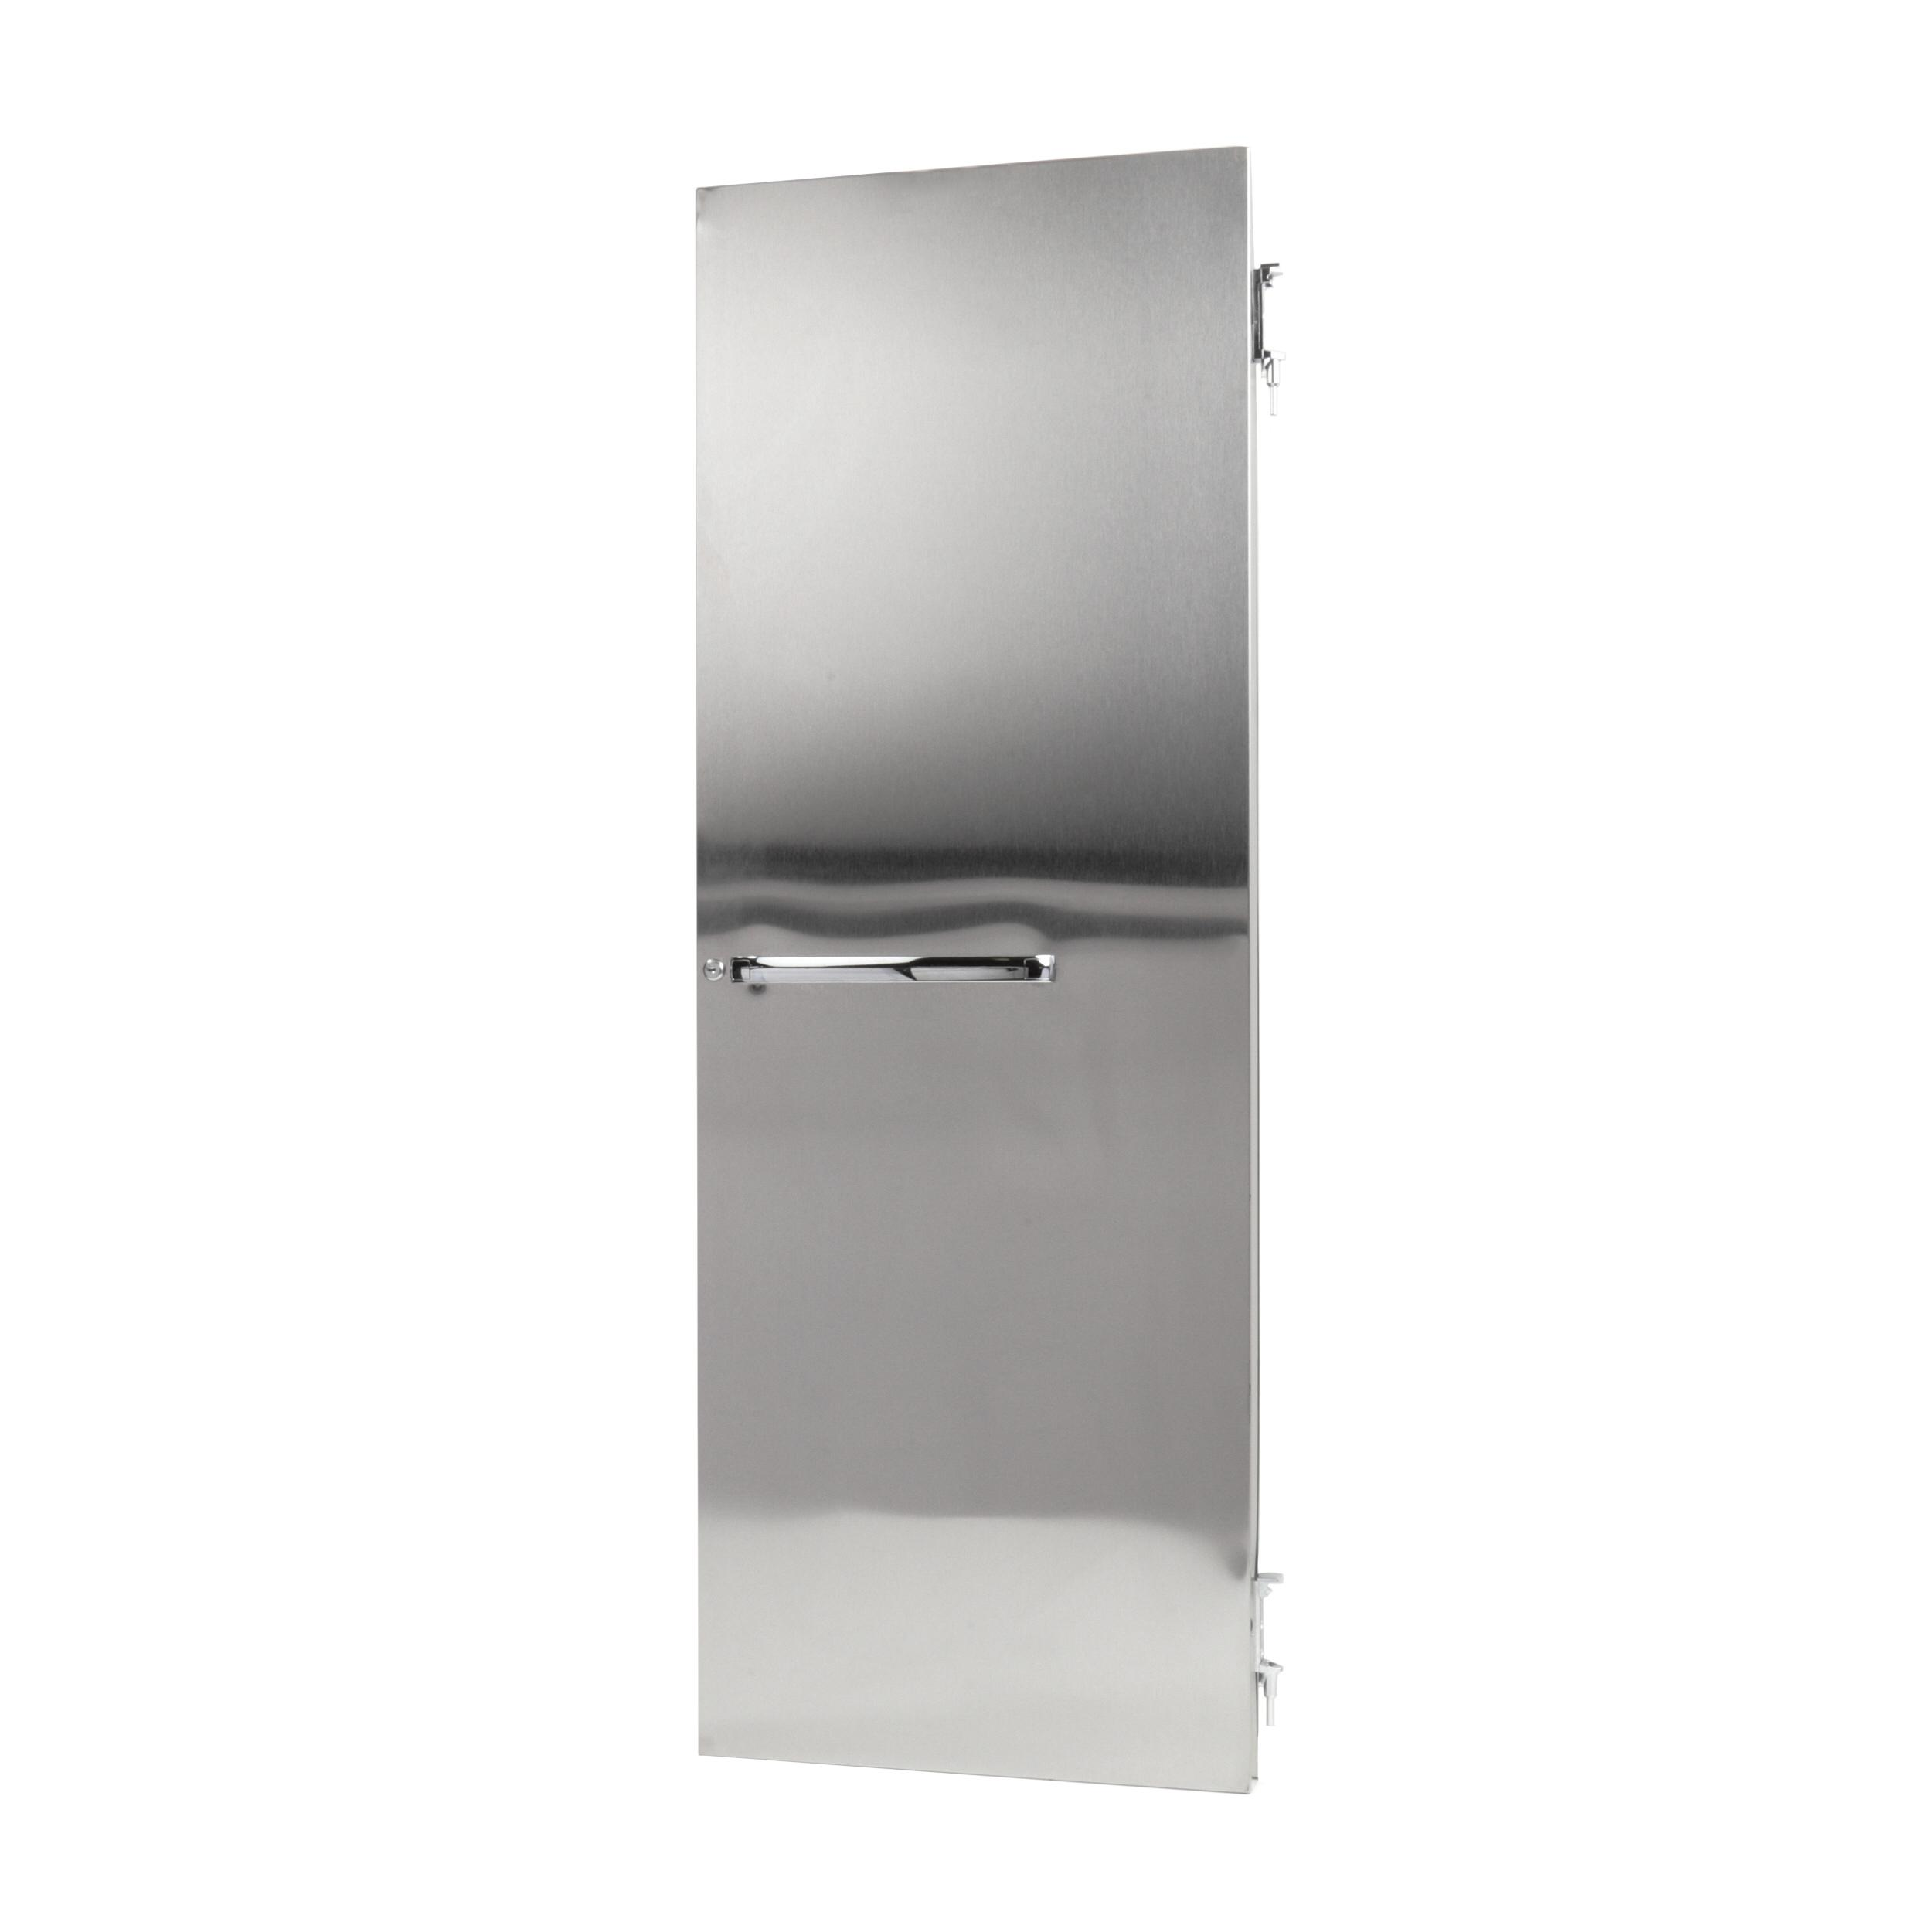 CONTINENTAL REFRIGERATOR DOOR